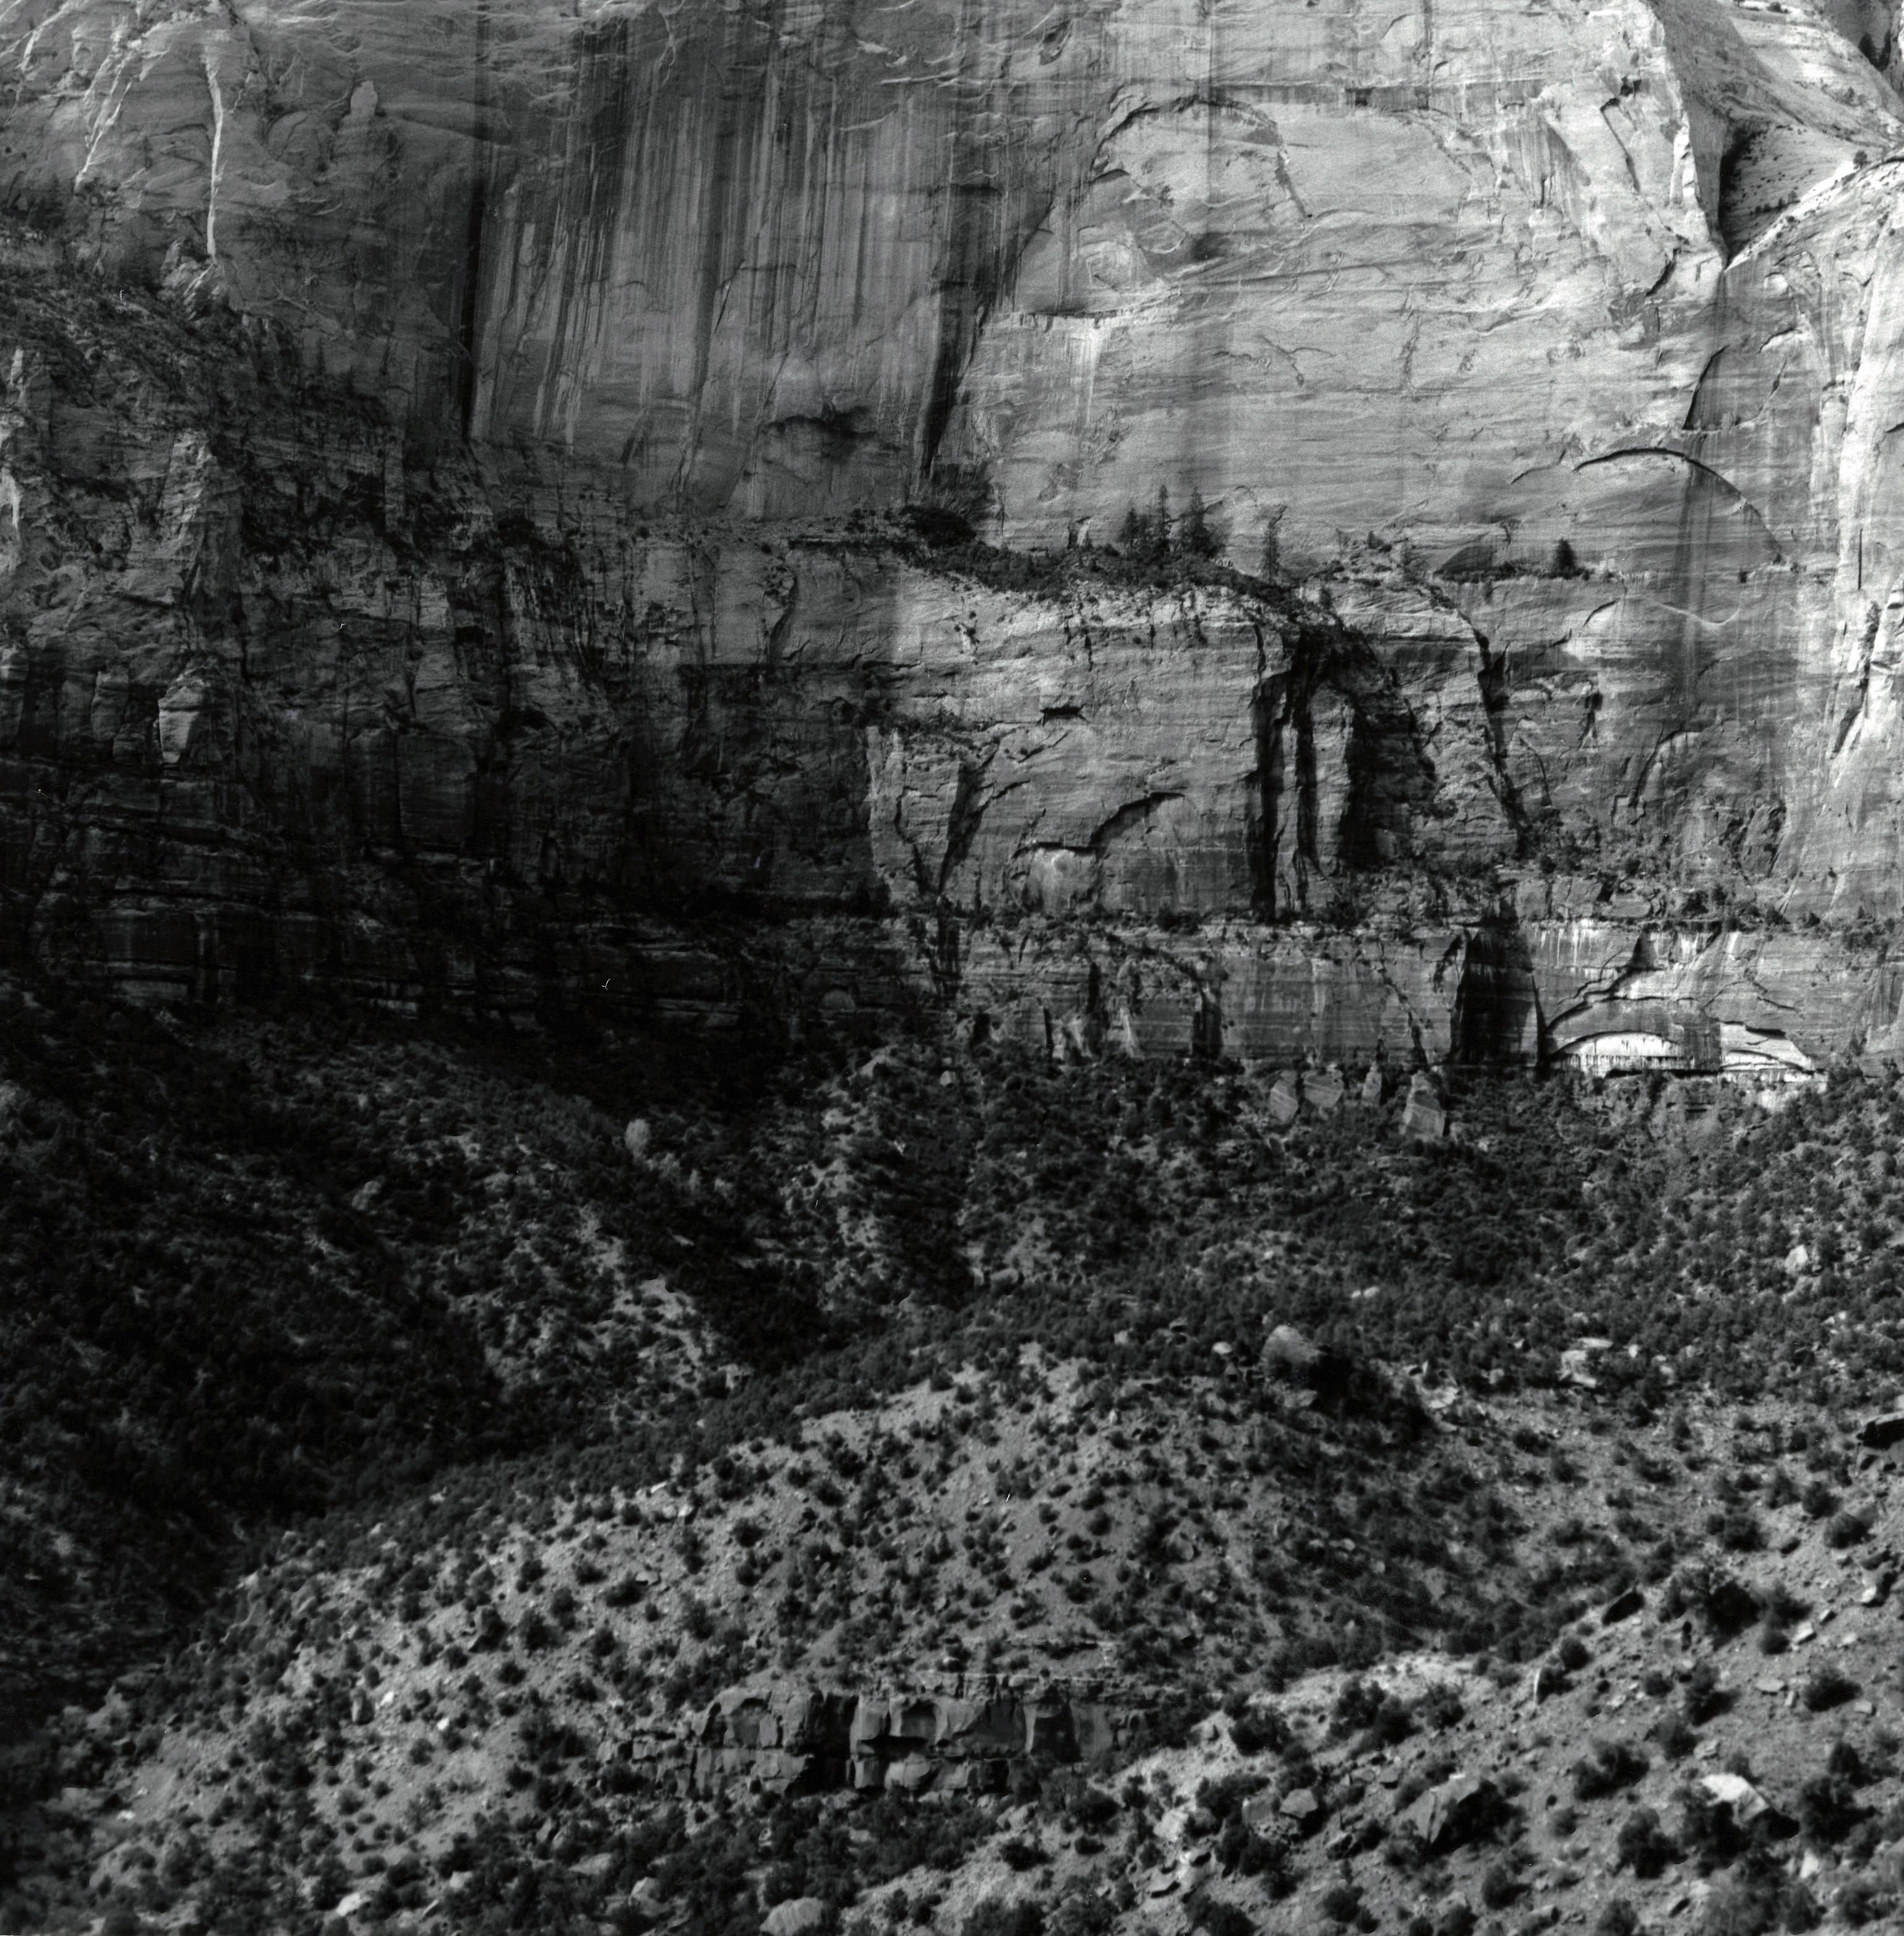 Canyon, Zion, Utah